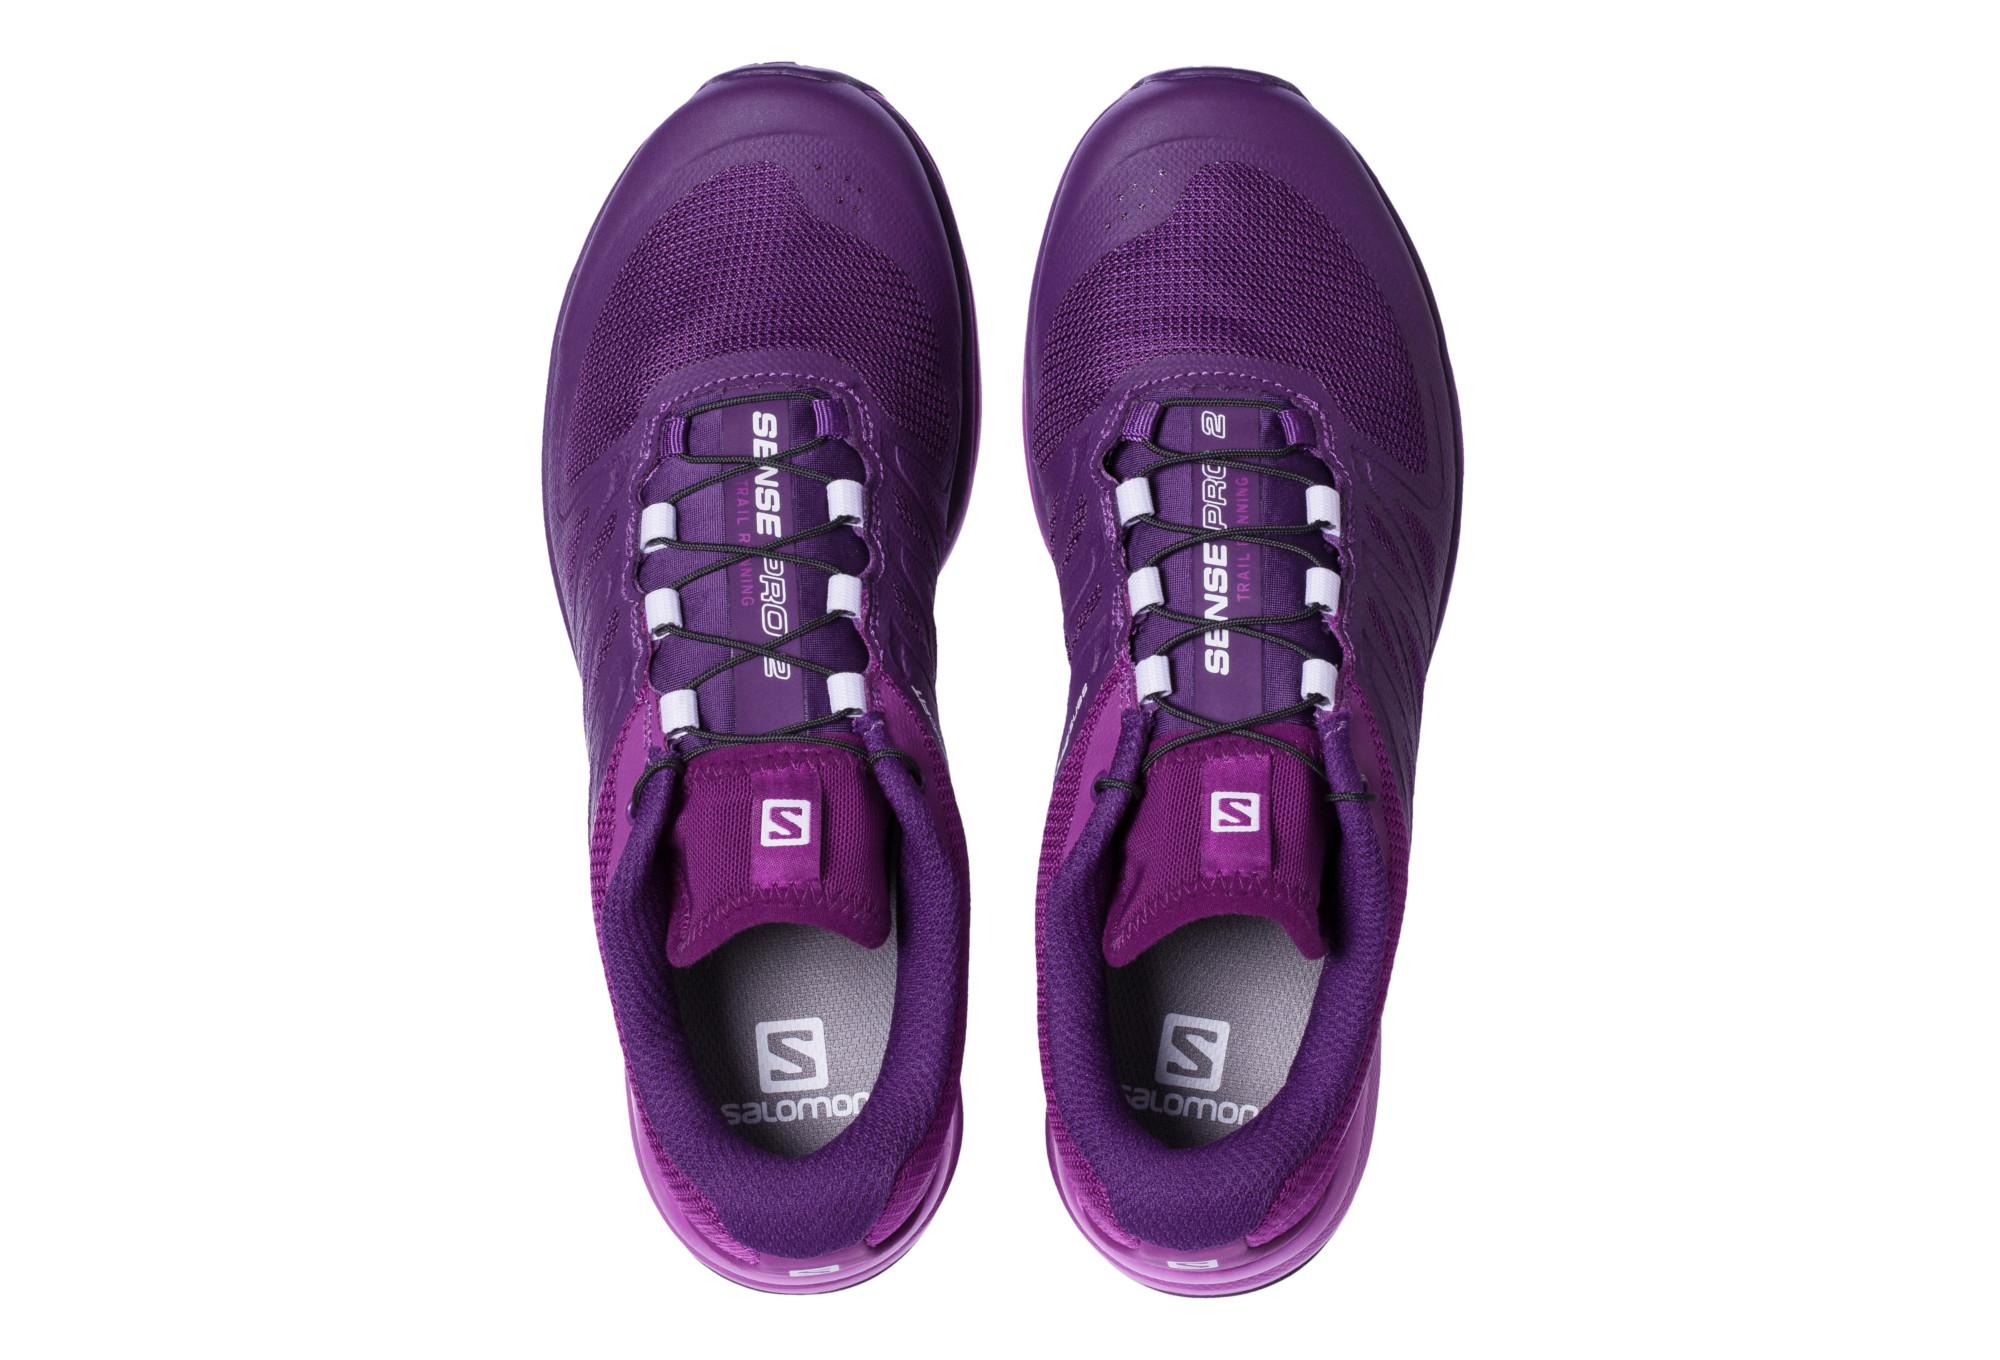 012882723e37 SALOMON Shoes SENSE PRO 2 COSMIC Purple Women